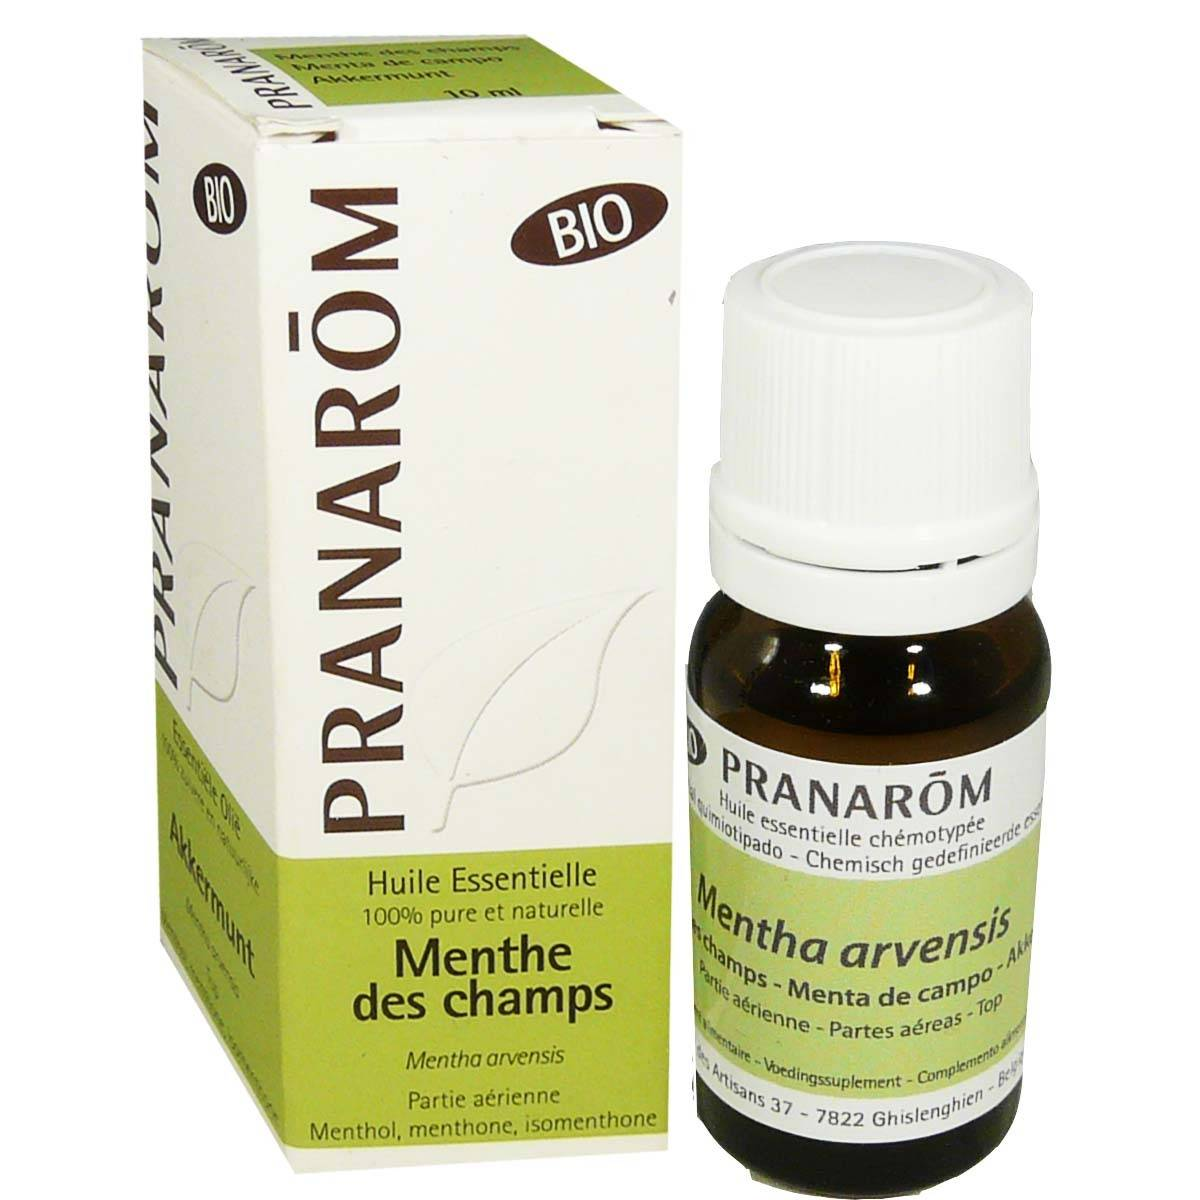 Pranarom huile essentielle menthe des champs bio 150 mg